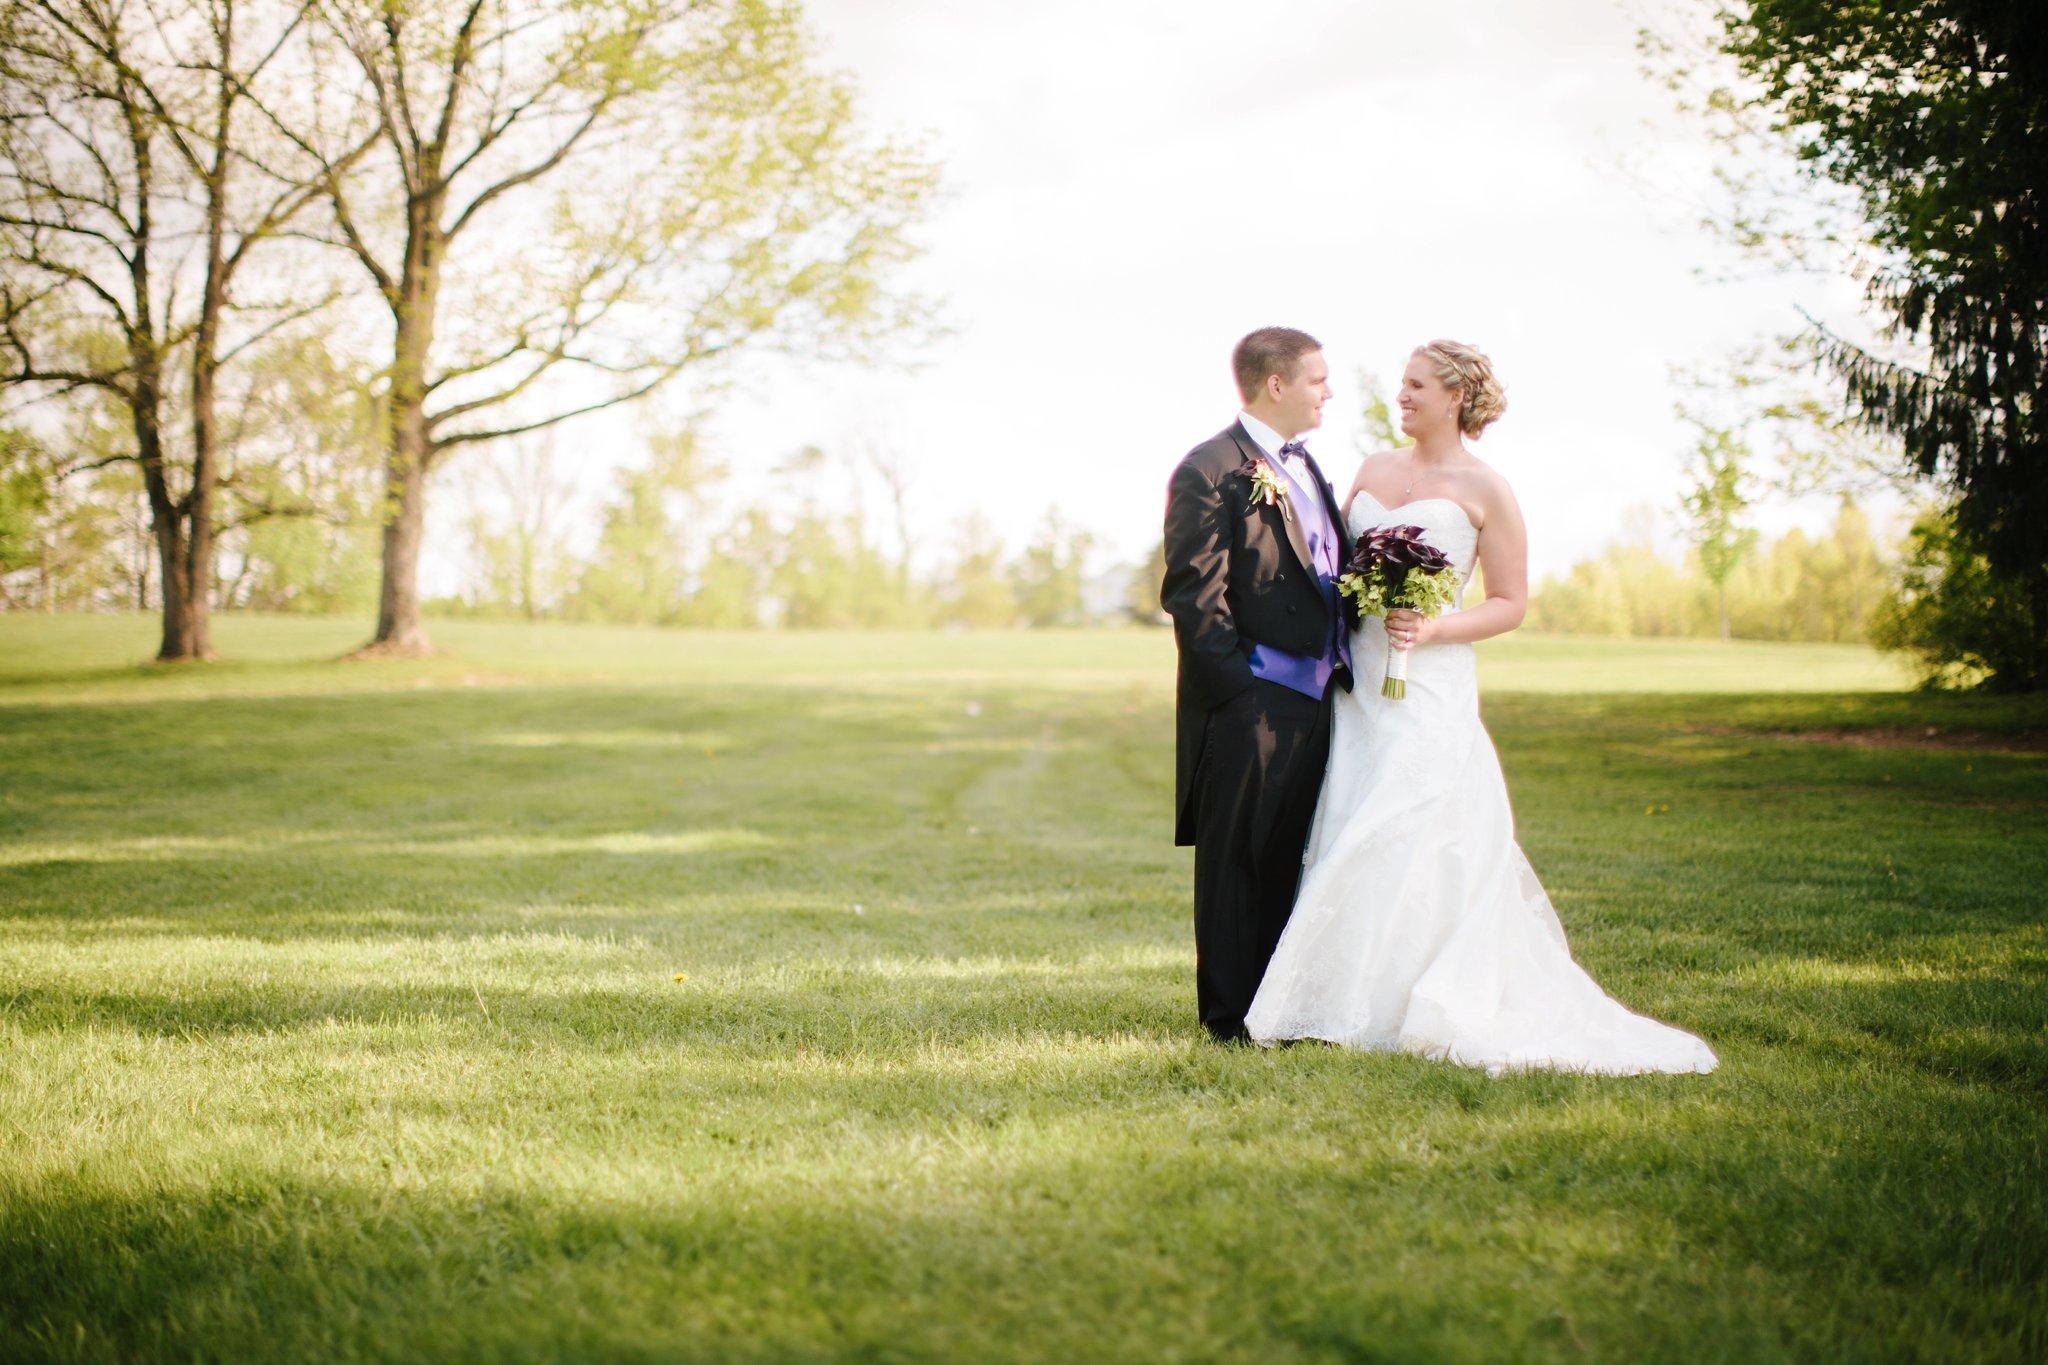 montdale_country_club_wedding_photos_photographer_scranton_pa7441.jpg